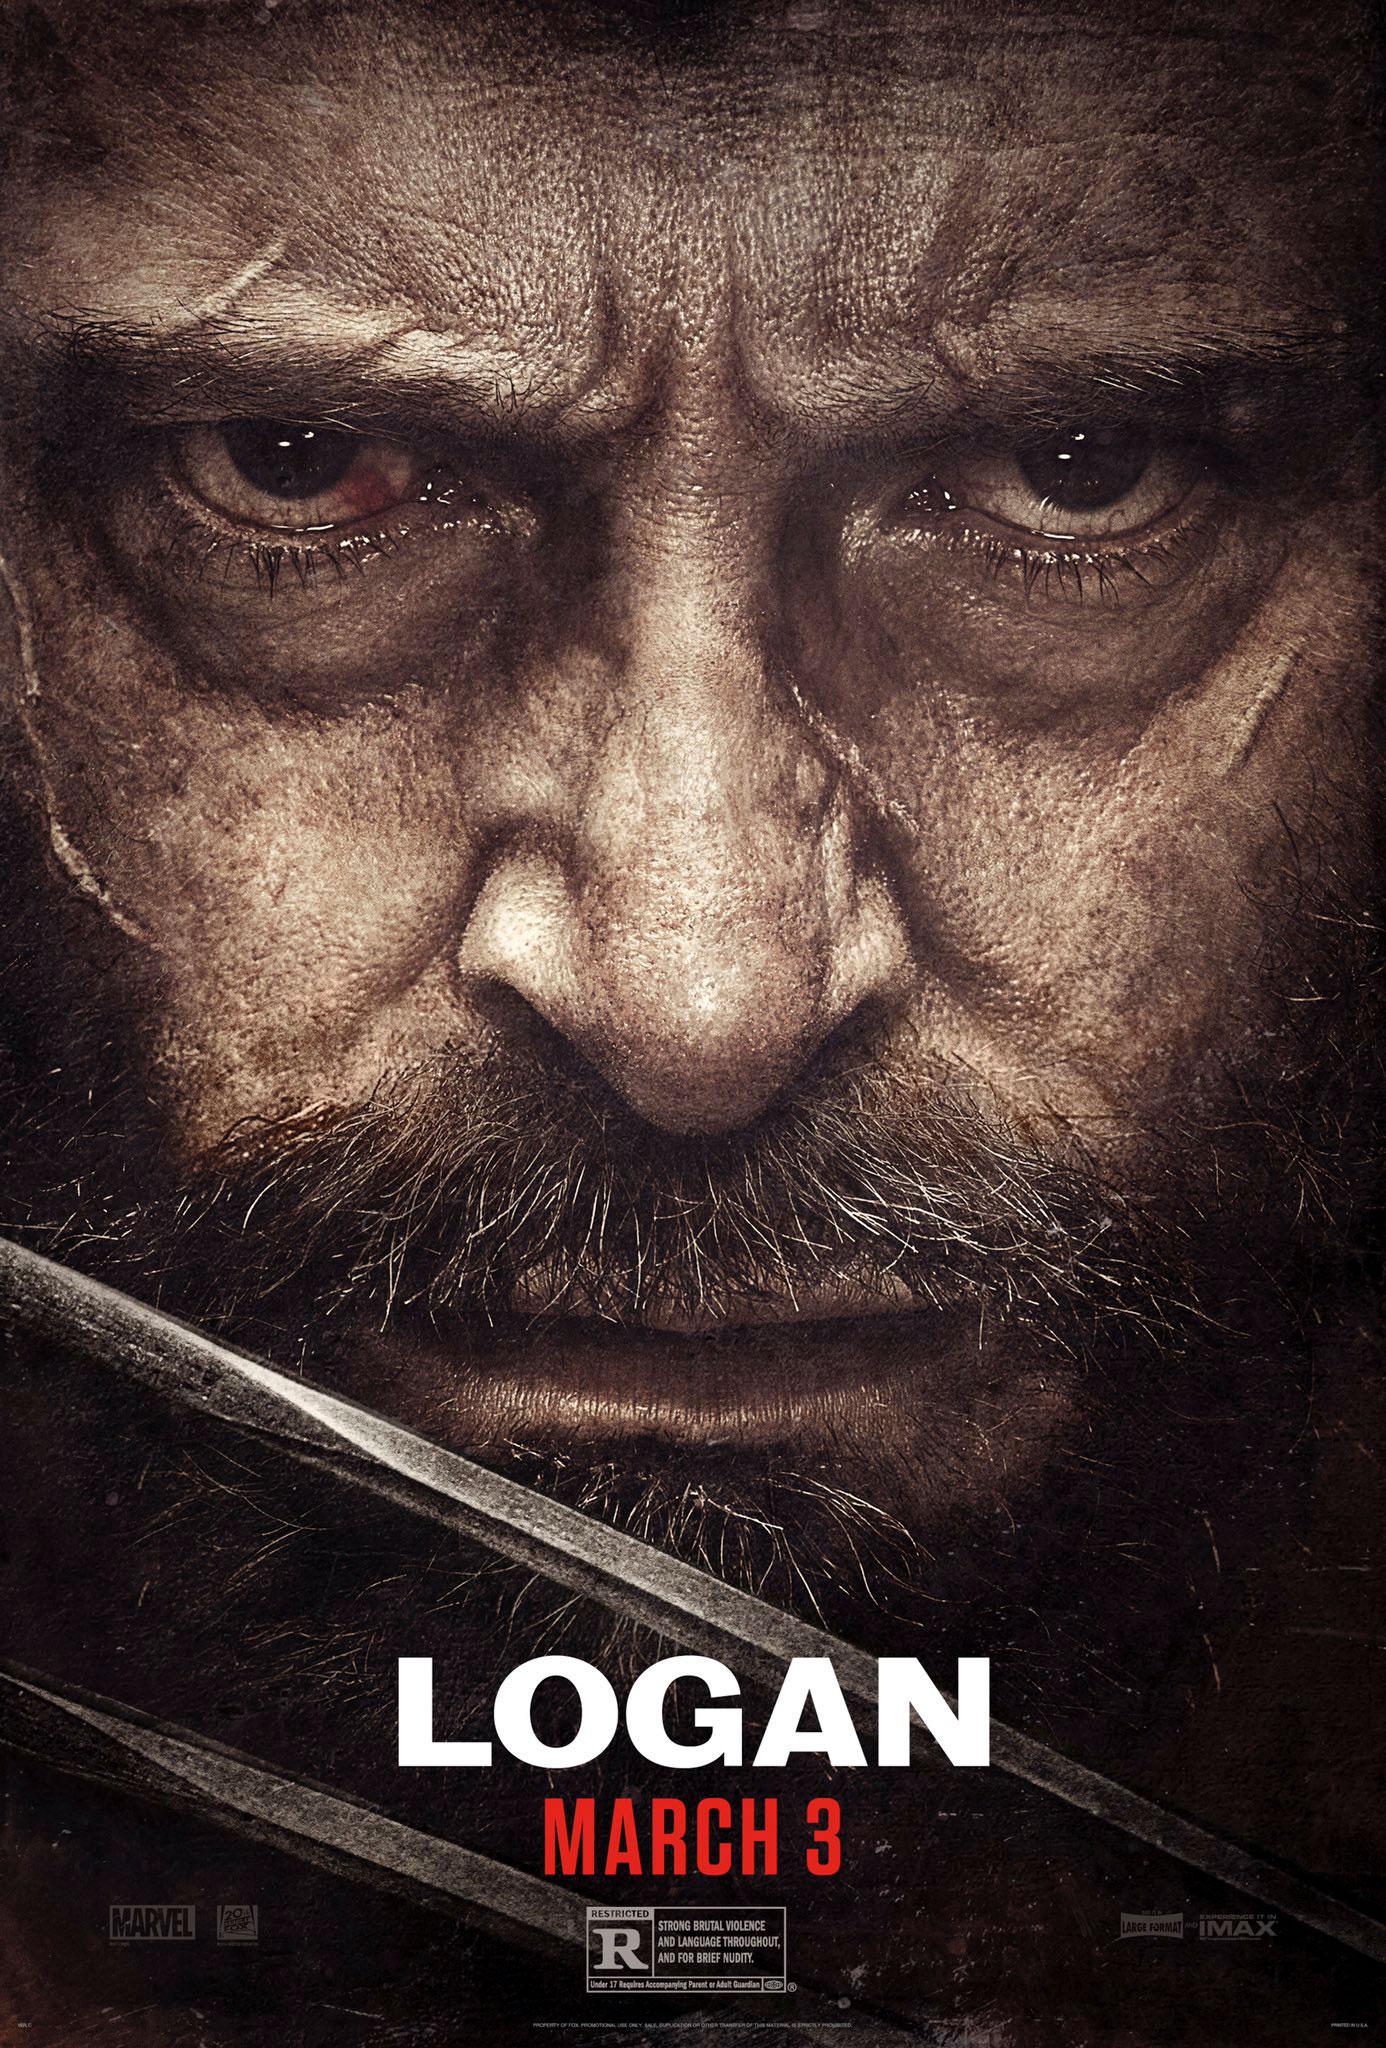 Logan - دانلود فیلم Logan دوبله فارسی با لینک مستقیم و به صورت رایگان